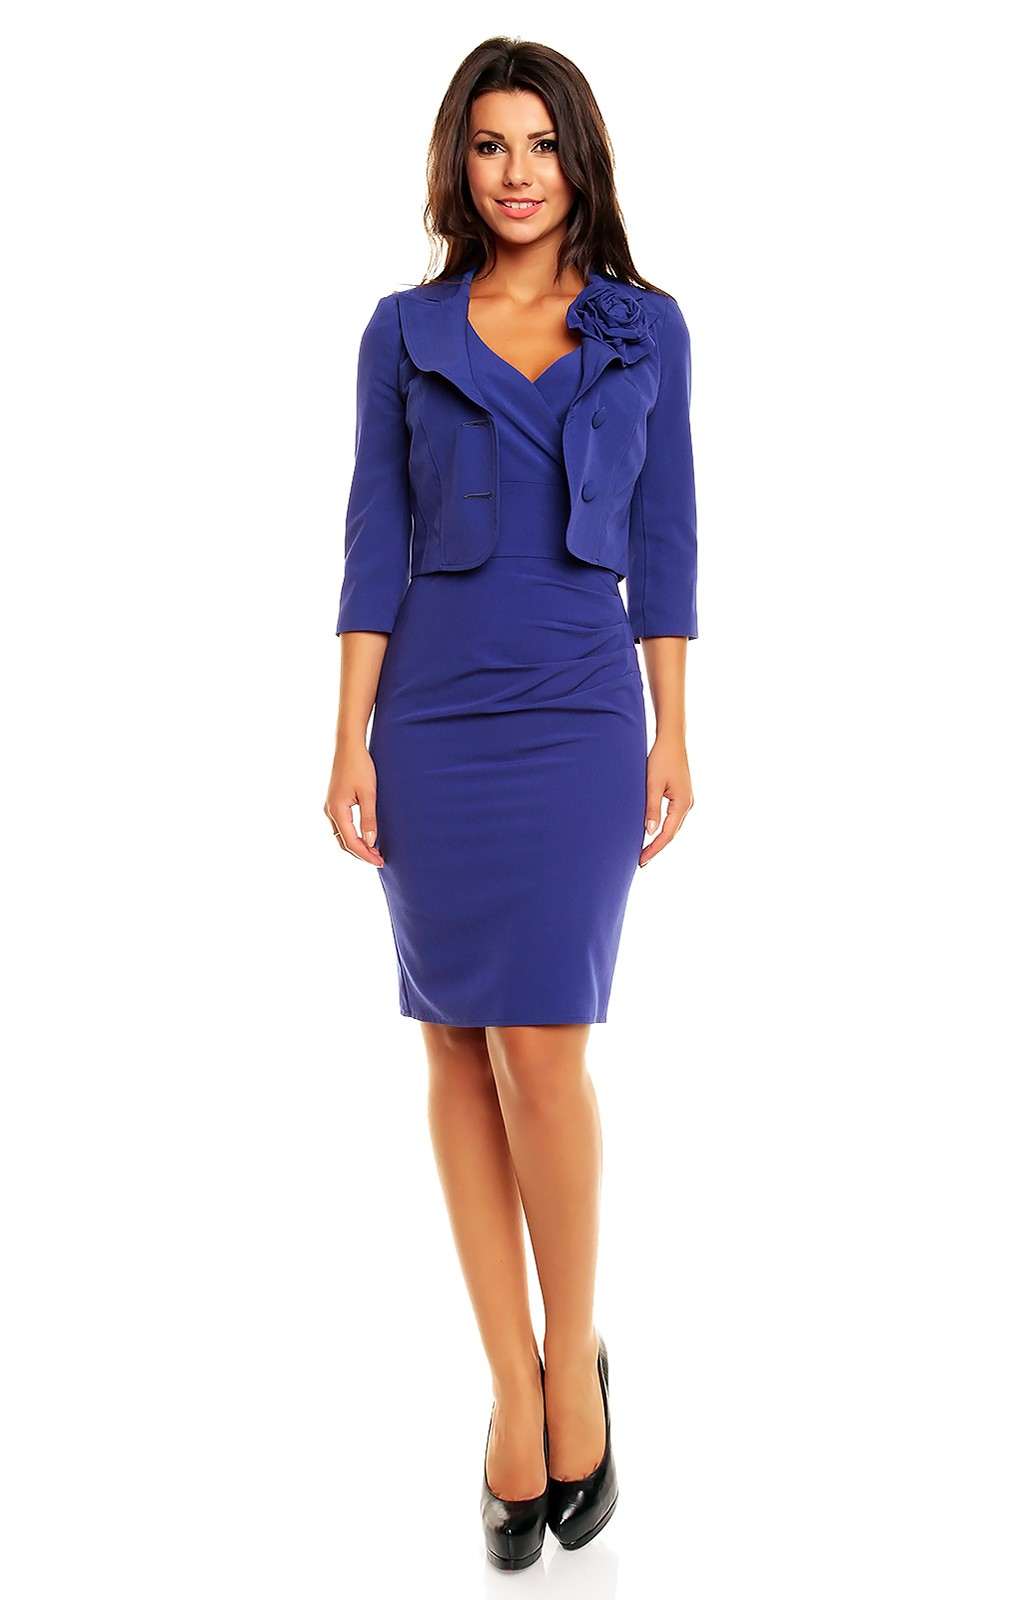 tailleur robe bleu km km162b idresstocode boutique de d shabill s et nuisettes robes et jupes. Black Bedroom Furniture Sets. Home Design Ideas